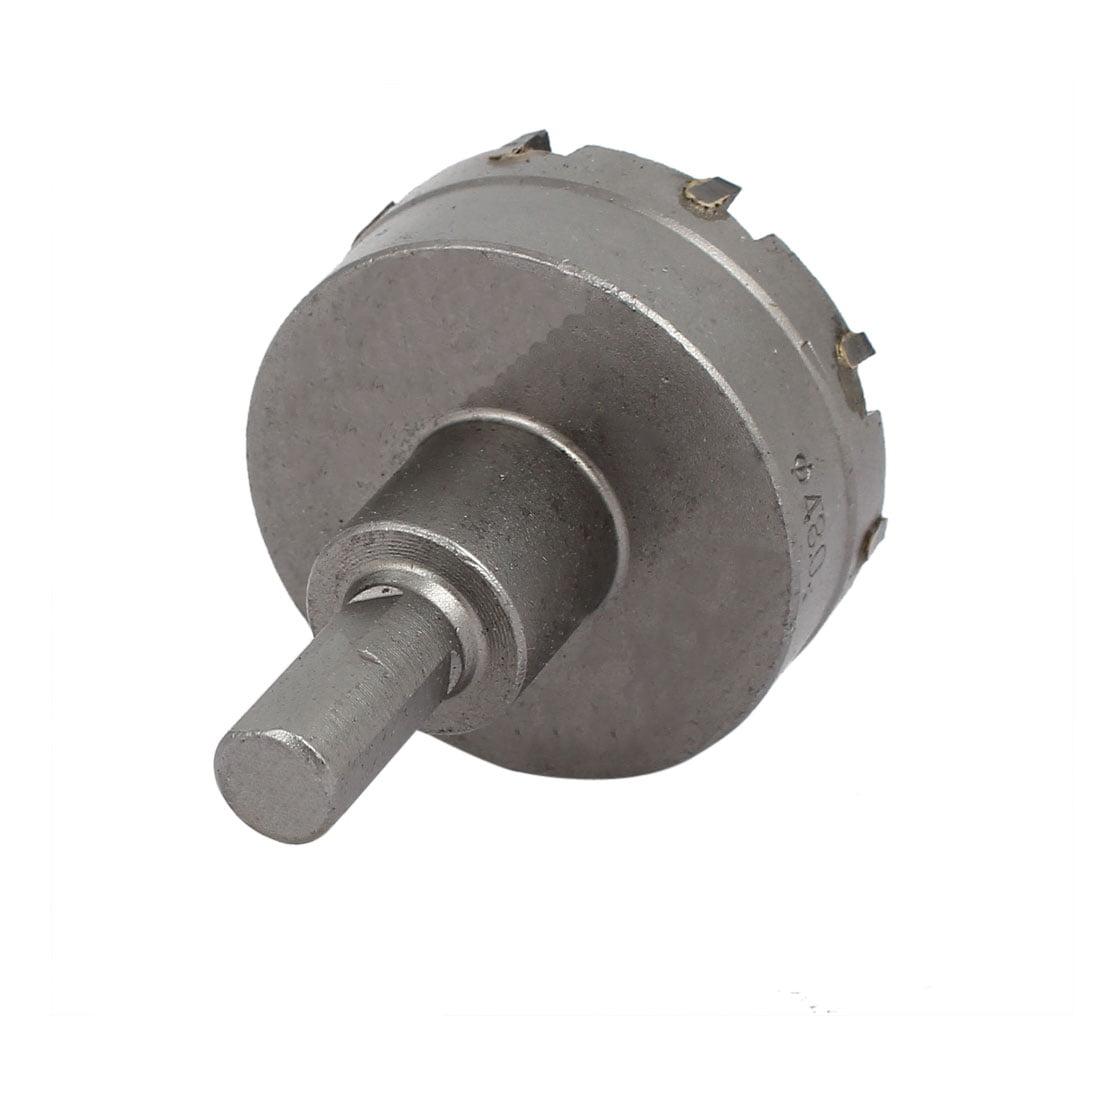 48mm Cutting Dia 6mm Twist Drilling Bit TCT Straight Shank Hole Saw Gray - image 2 de 3